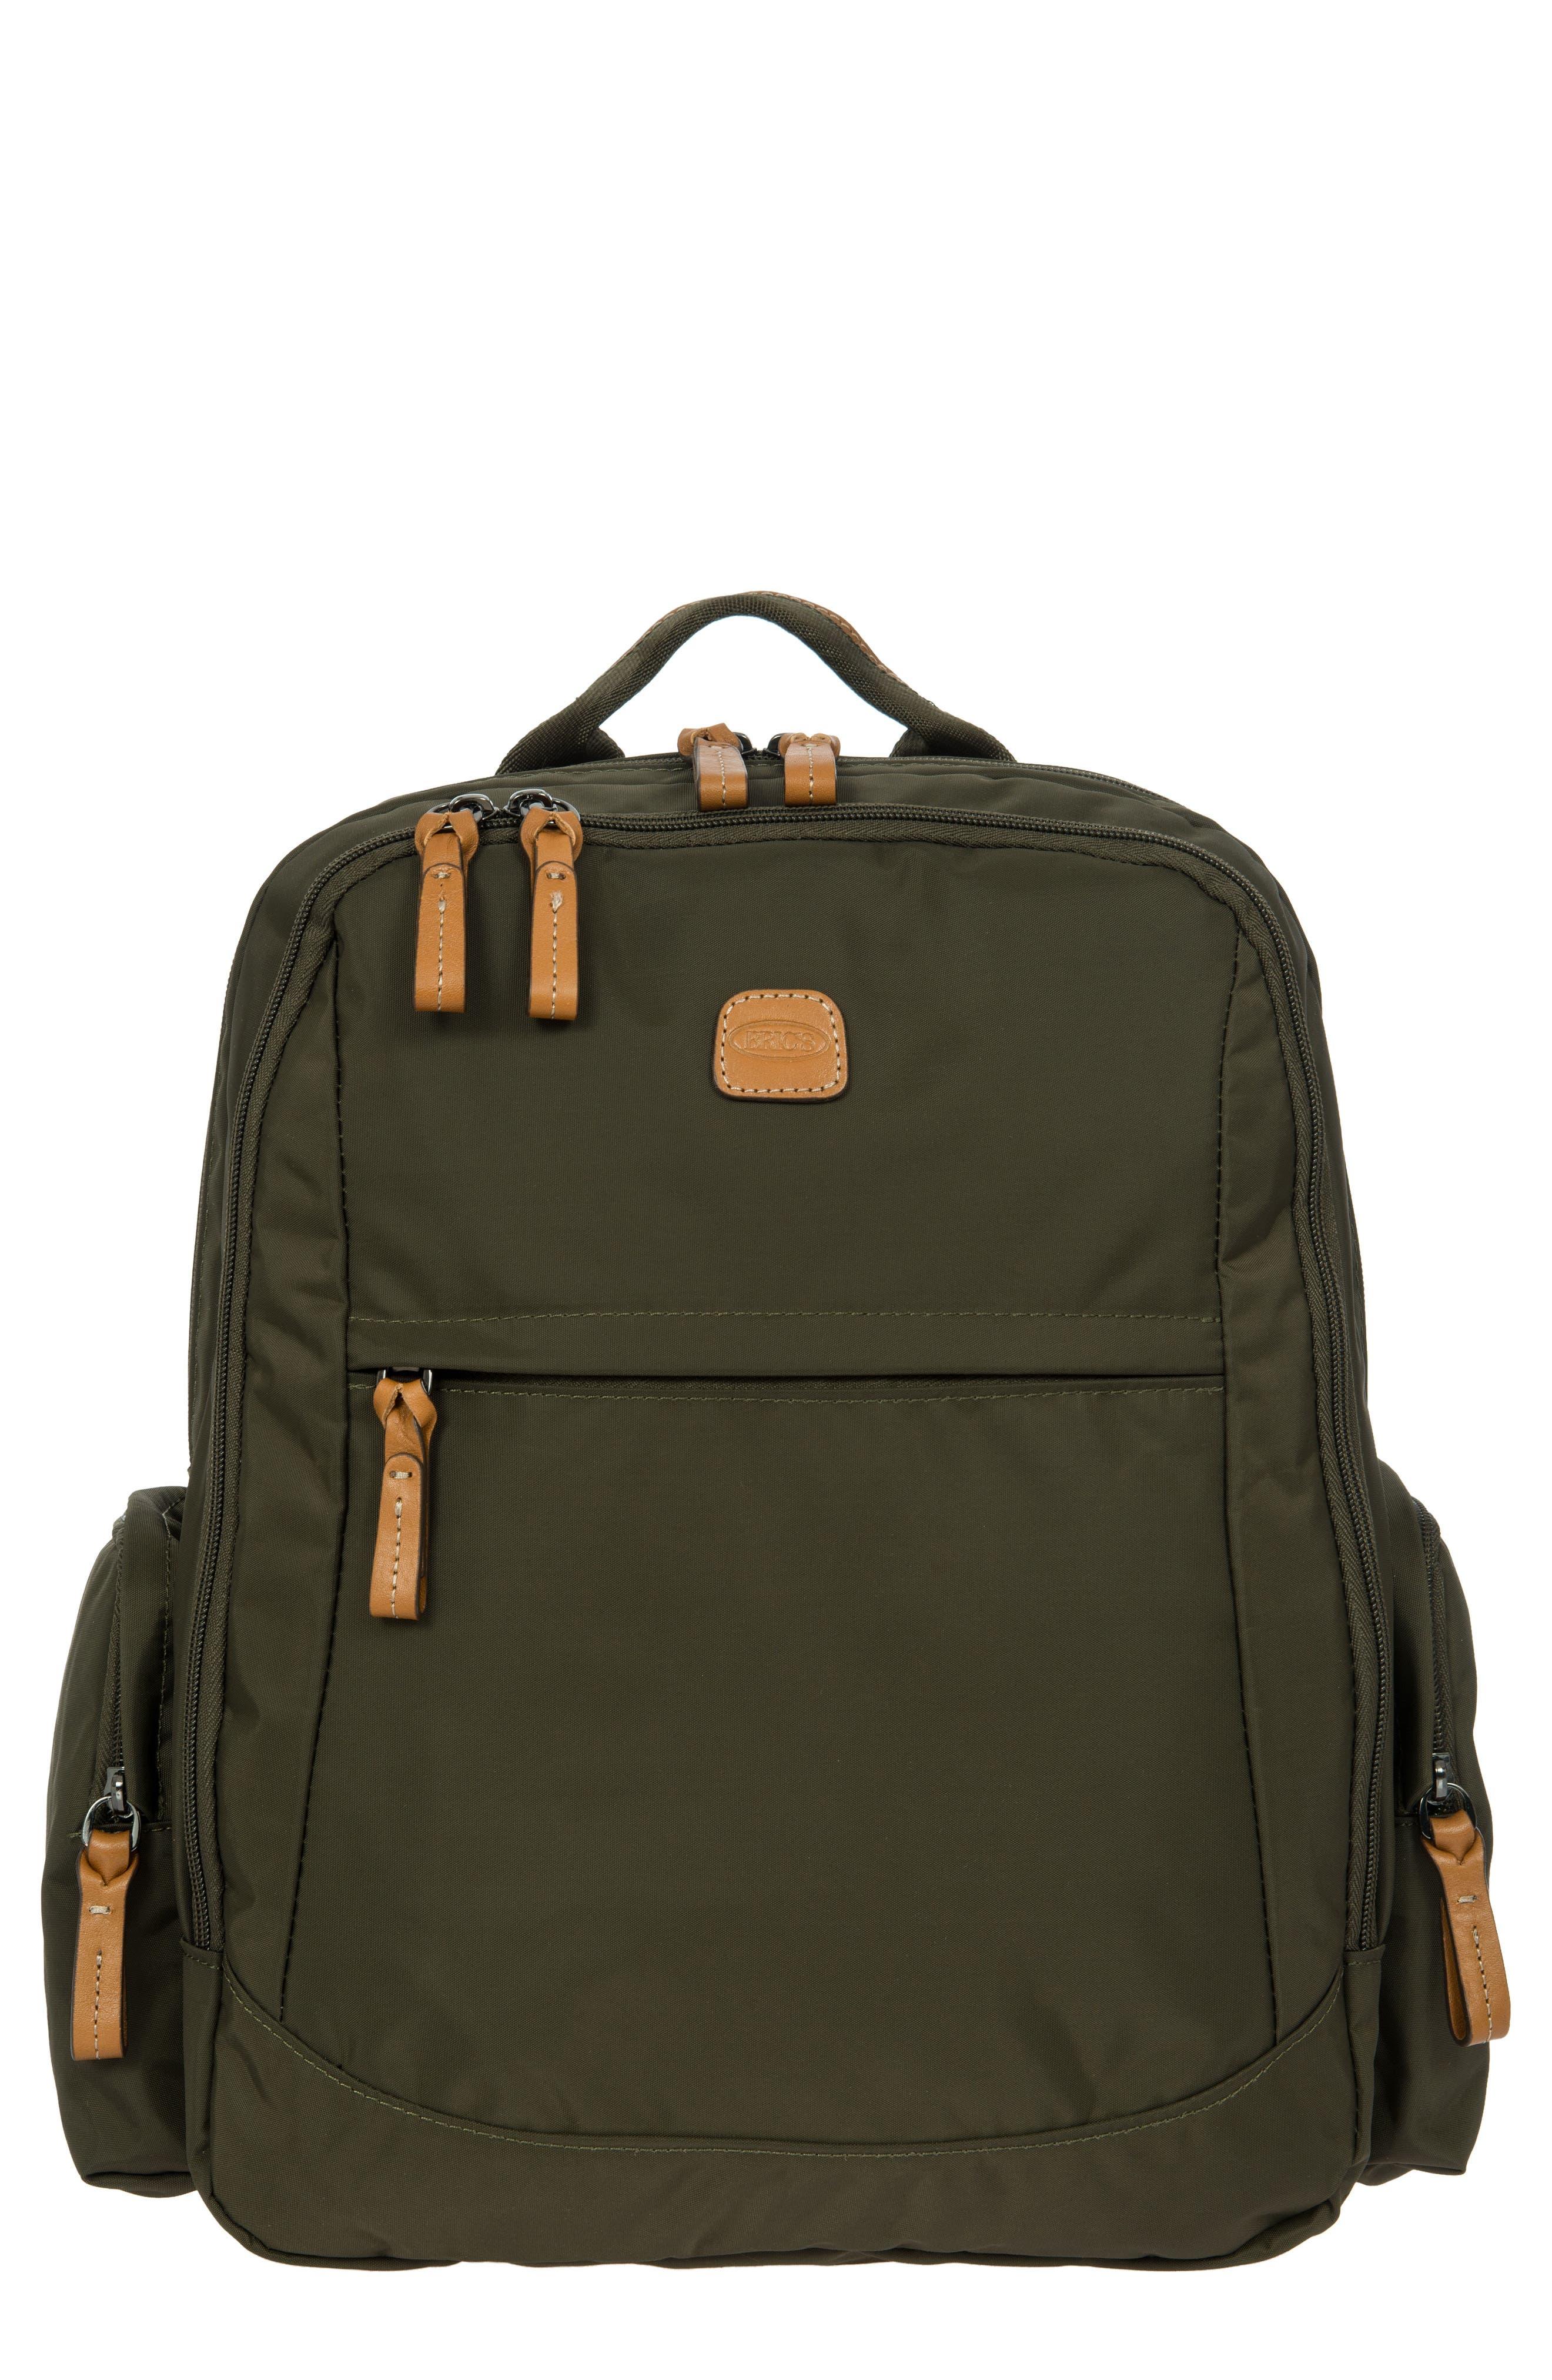 X-Travel Nomad Backpack,                         Main,                         color, Olive